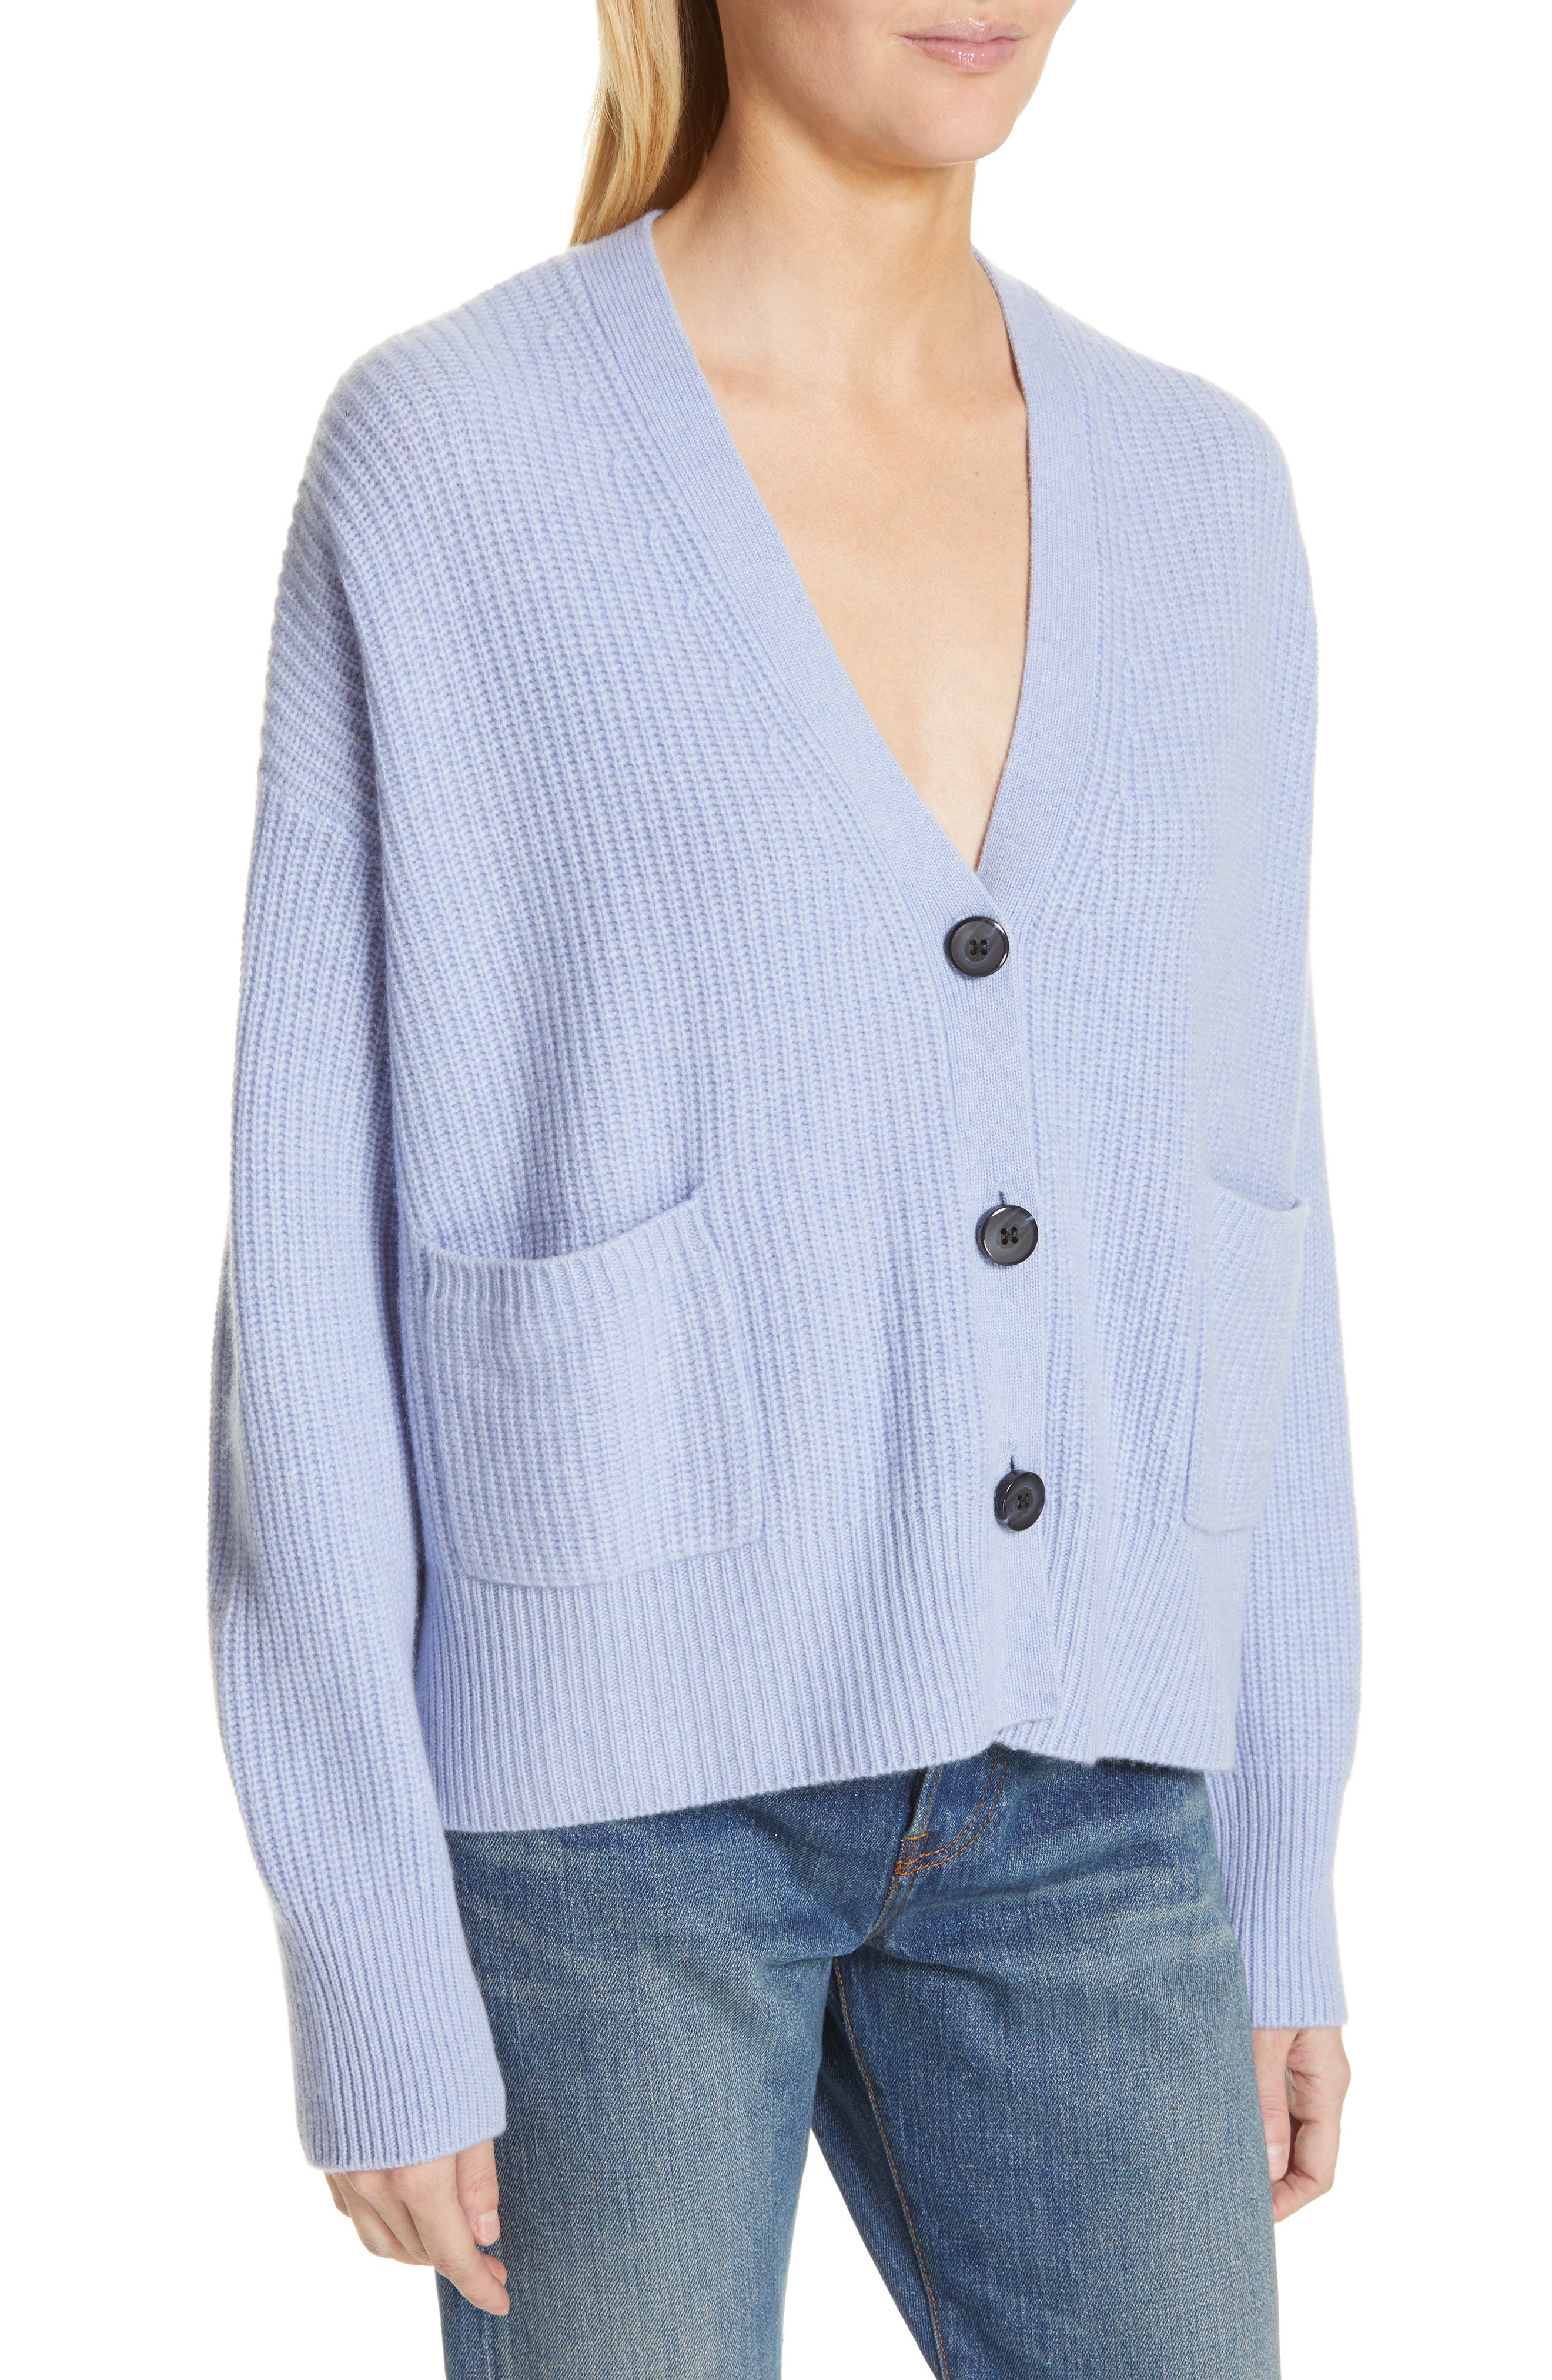 NORDSTROM SIGNATURE, Cashmere Pocket Cardigan, Alternate thumbnail 4, color, BLUE LUSTRE HEATHER